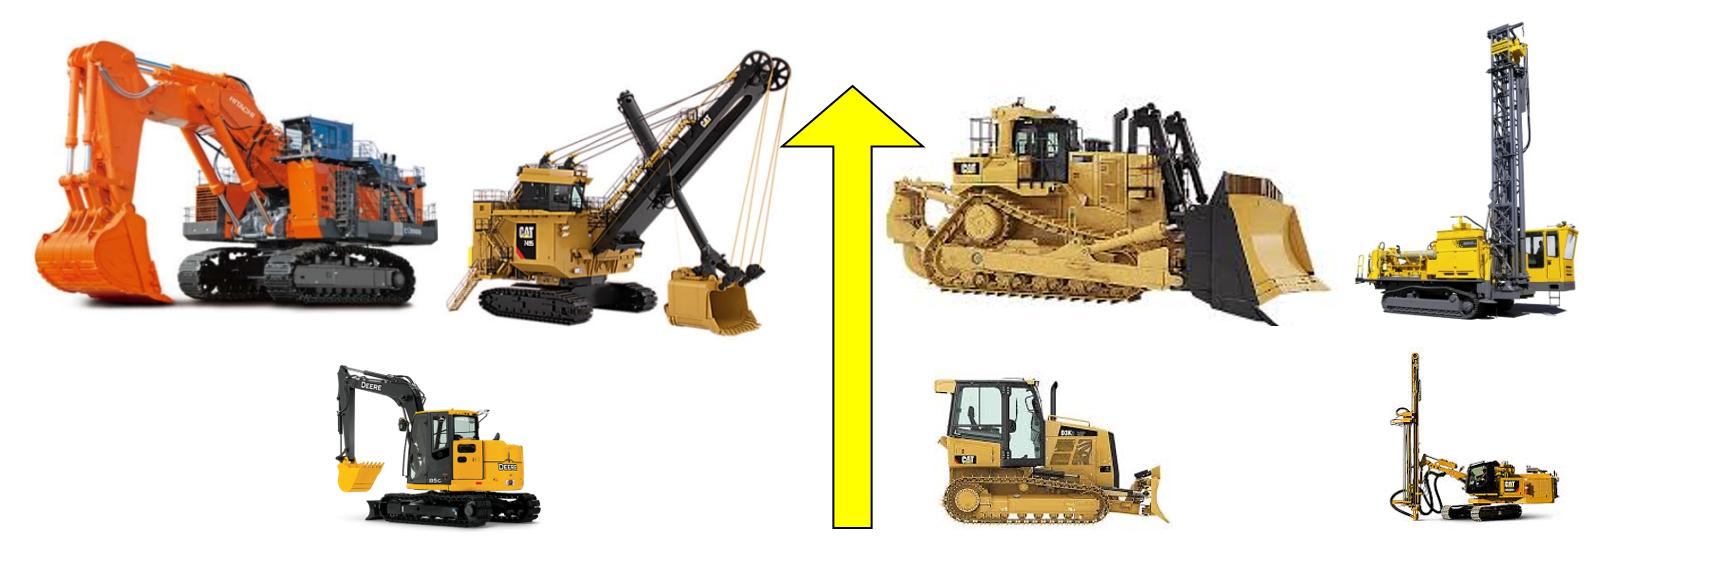 Machine Models